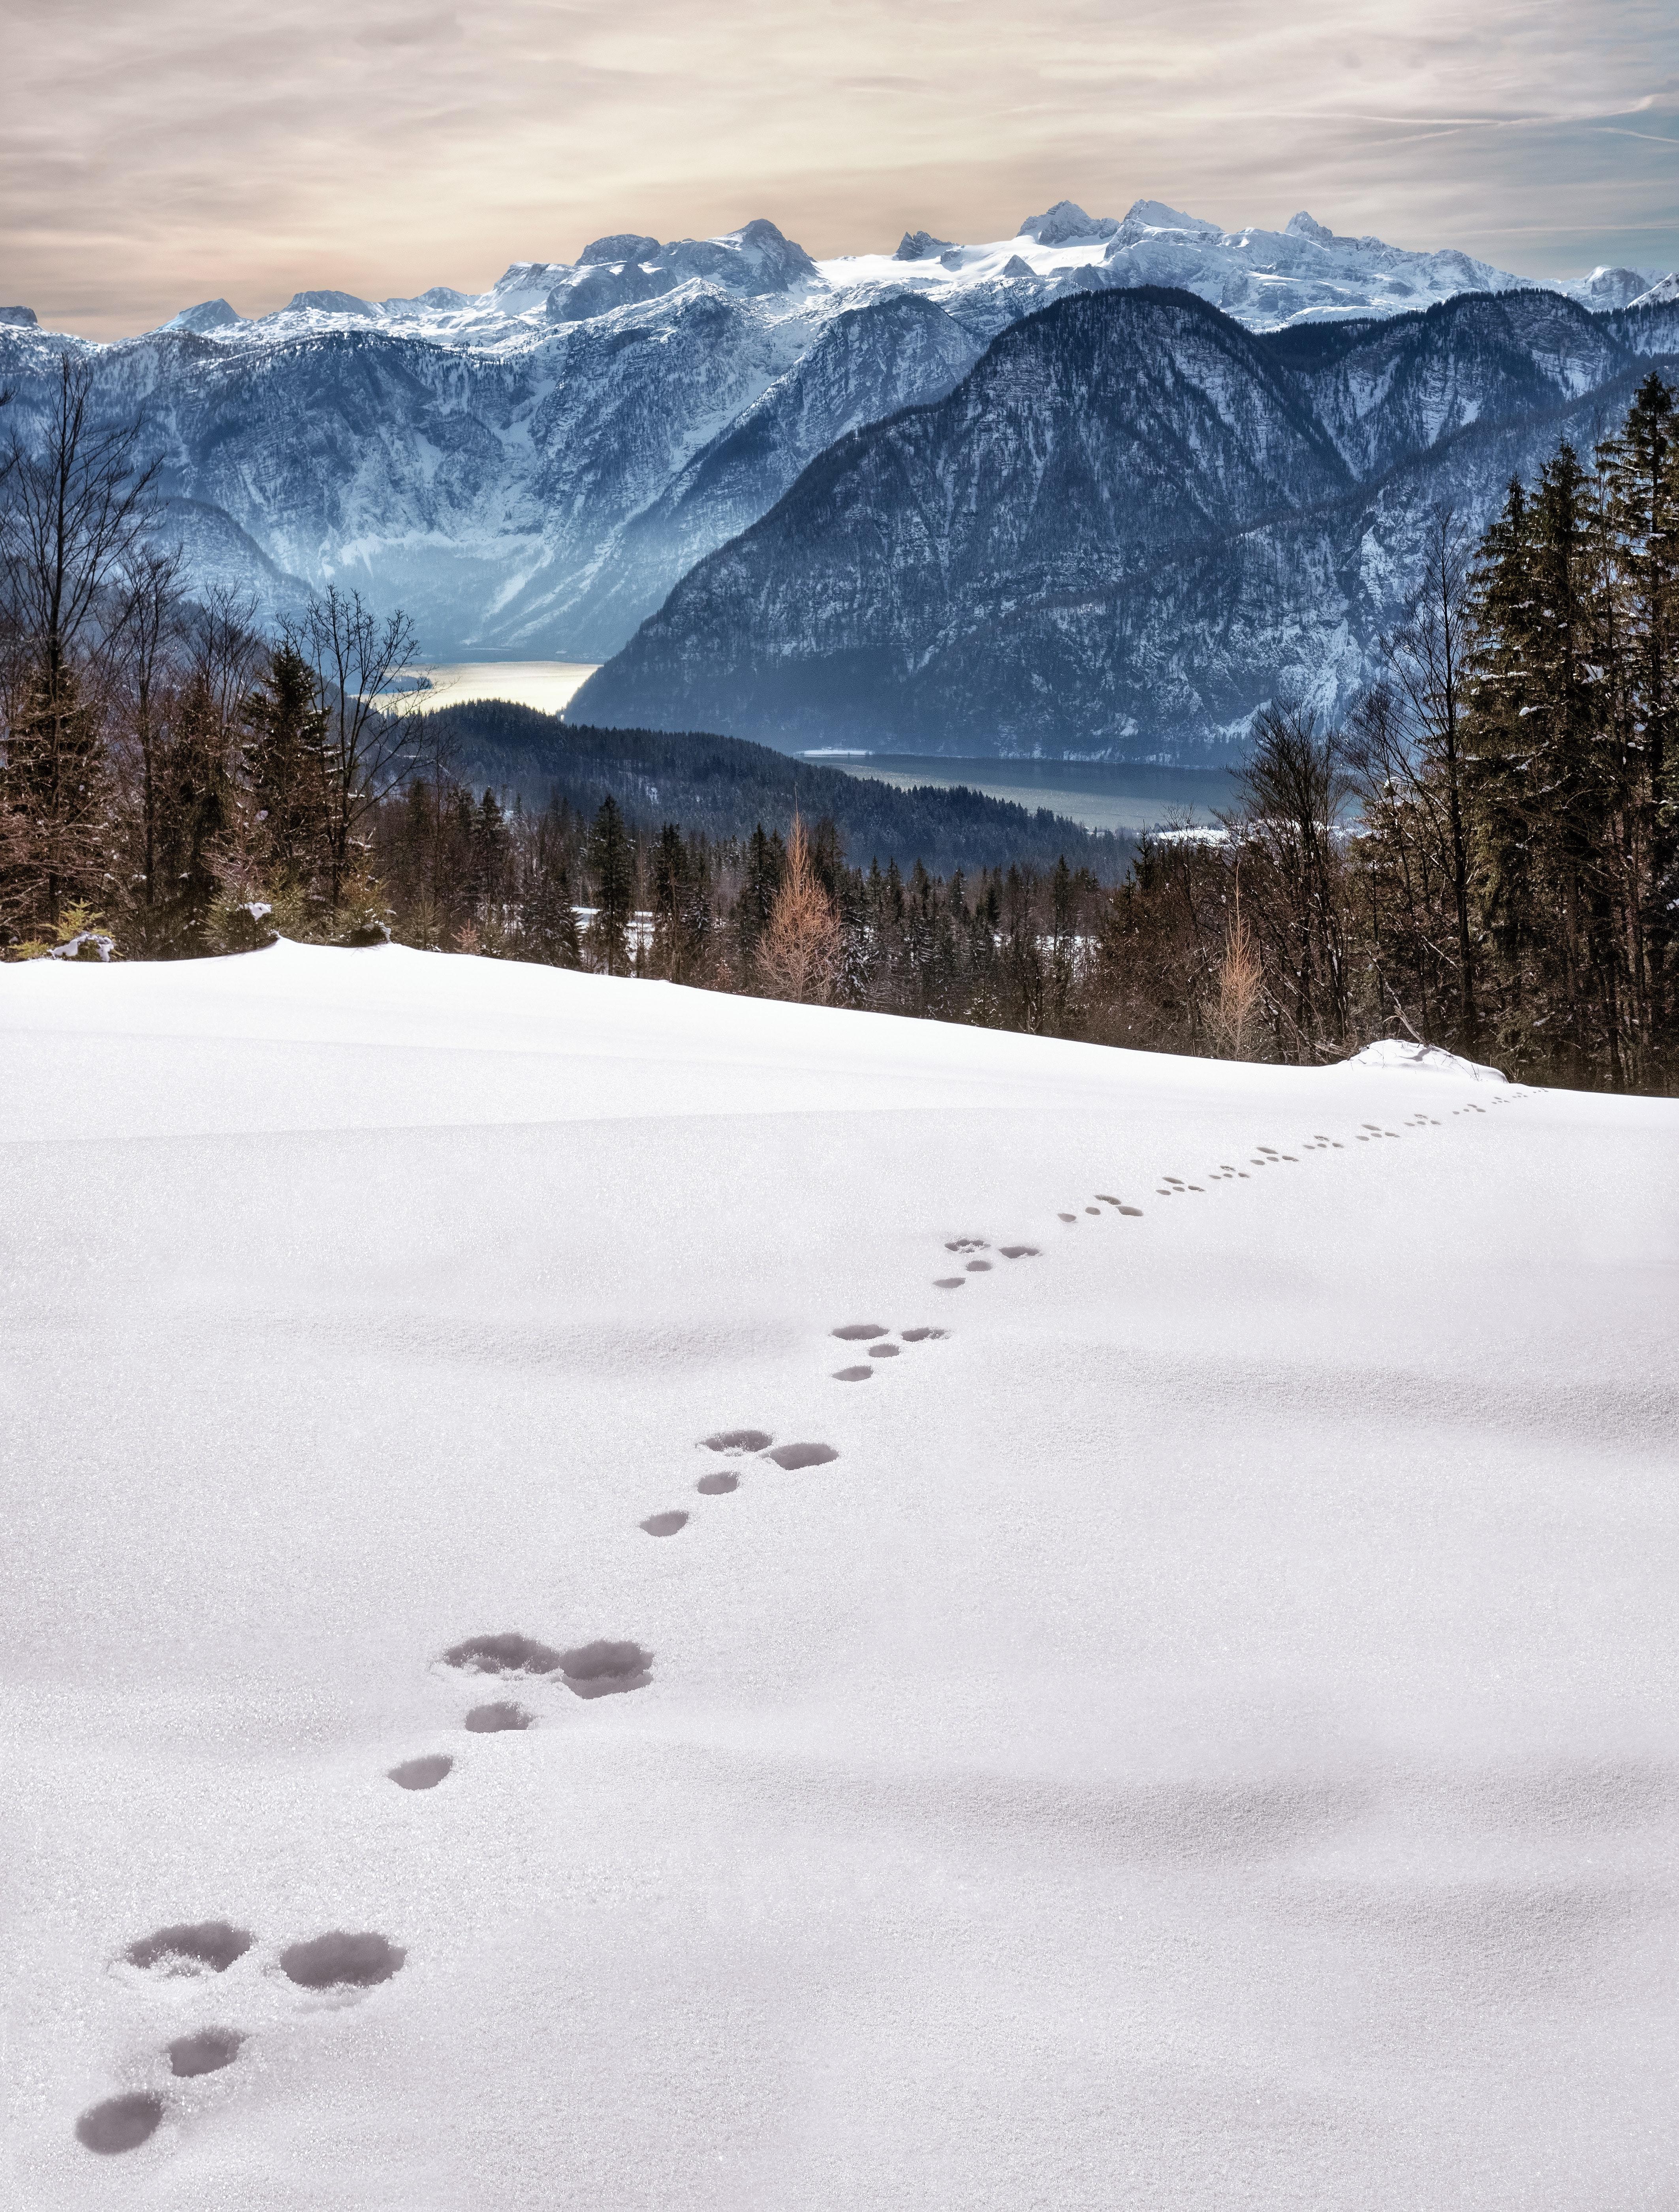 Animal foot prints on snow near mountain at daytime photo